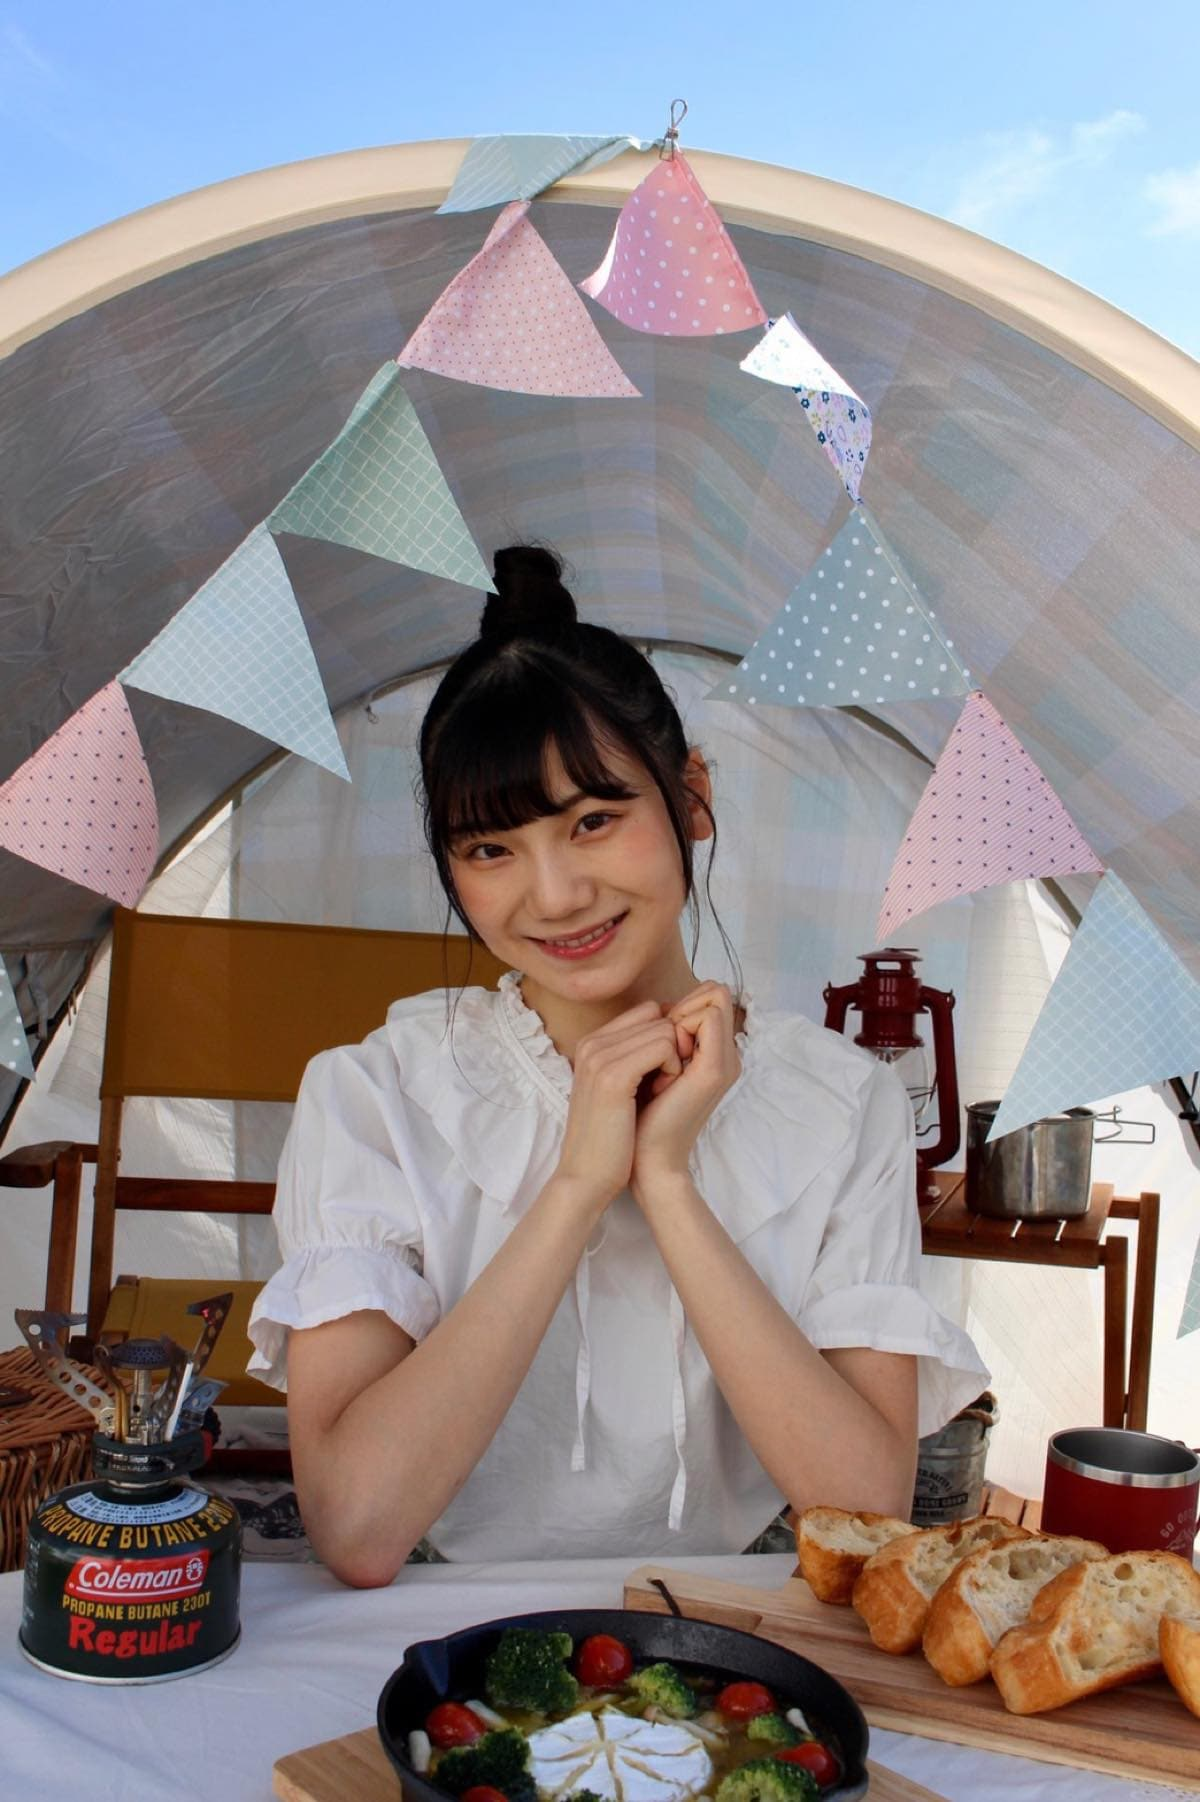 NGT48新センターを務める藤崎未夢がキャンプ・アウトドア情報メディアで連載スタート!の画像001